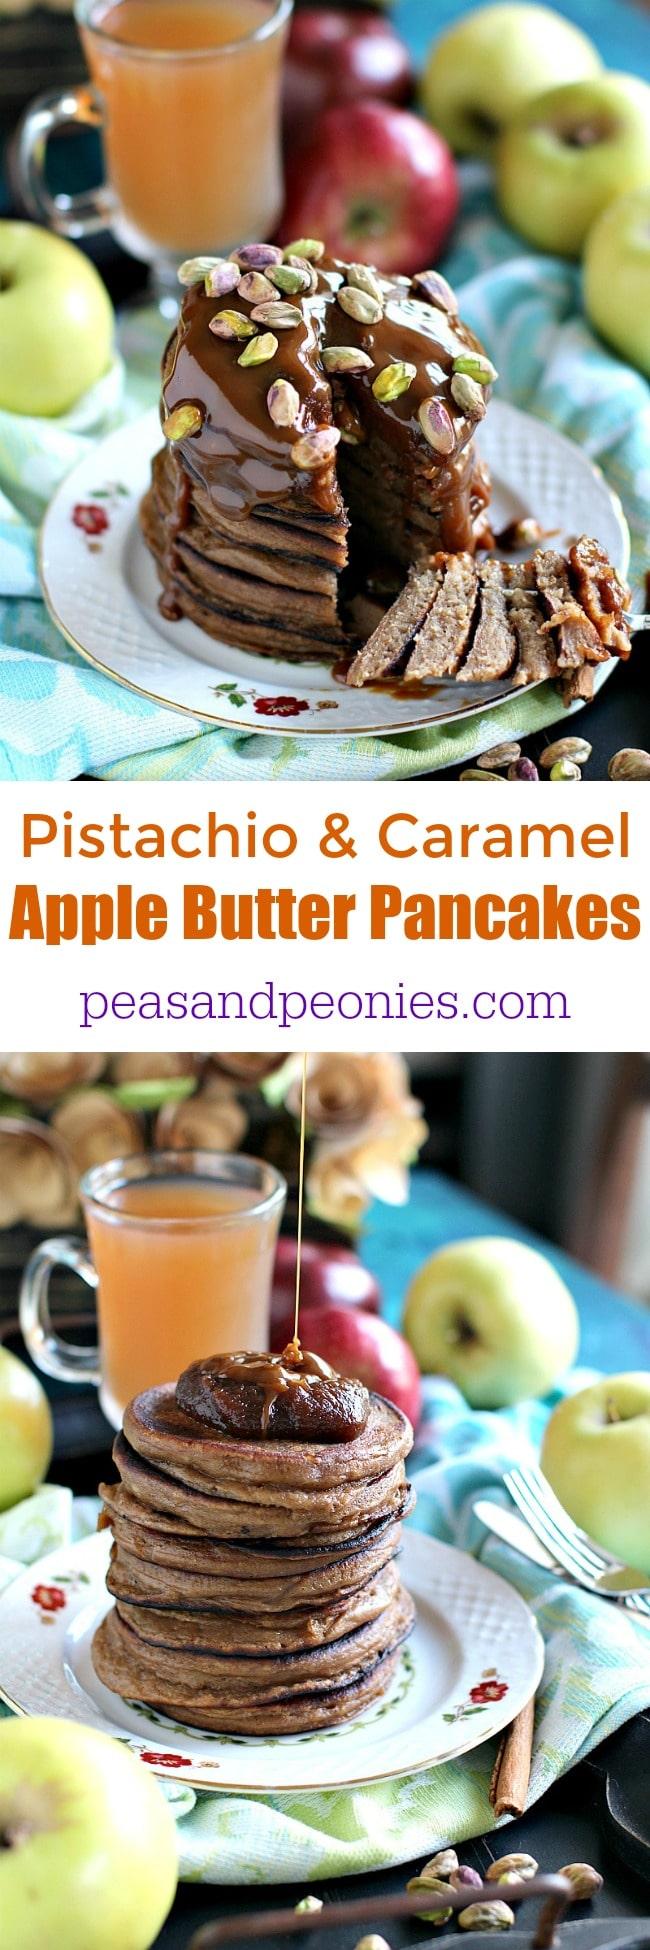 Pistachio Caramel Apple Butter Pancakes 210